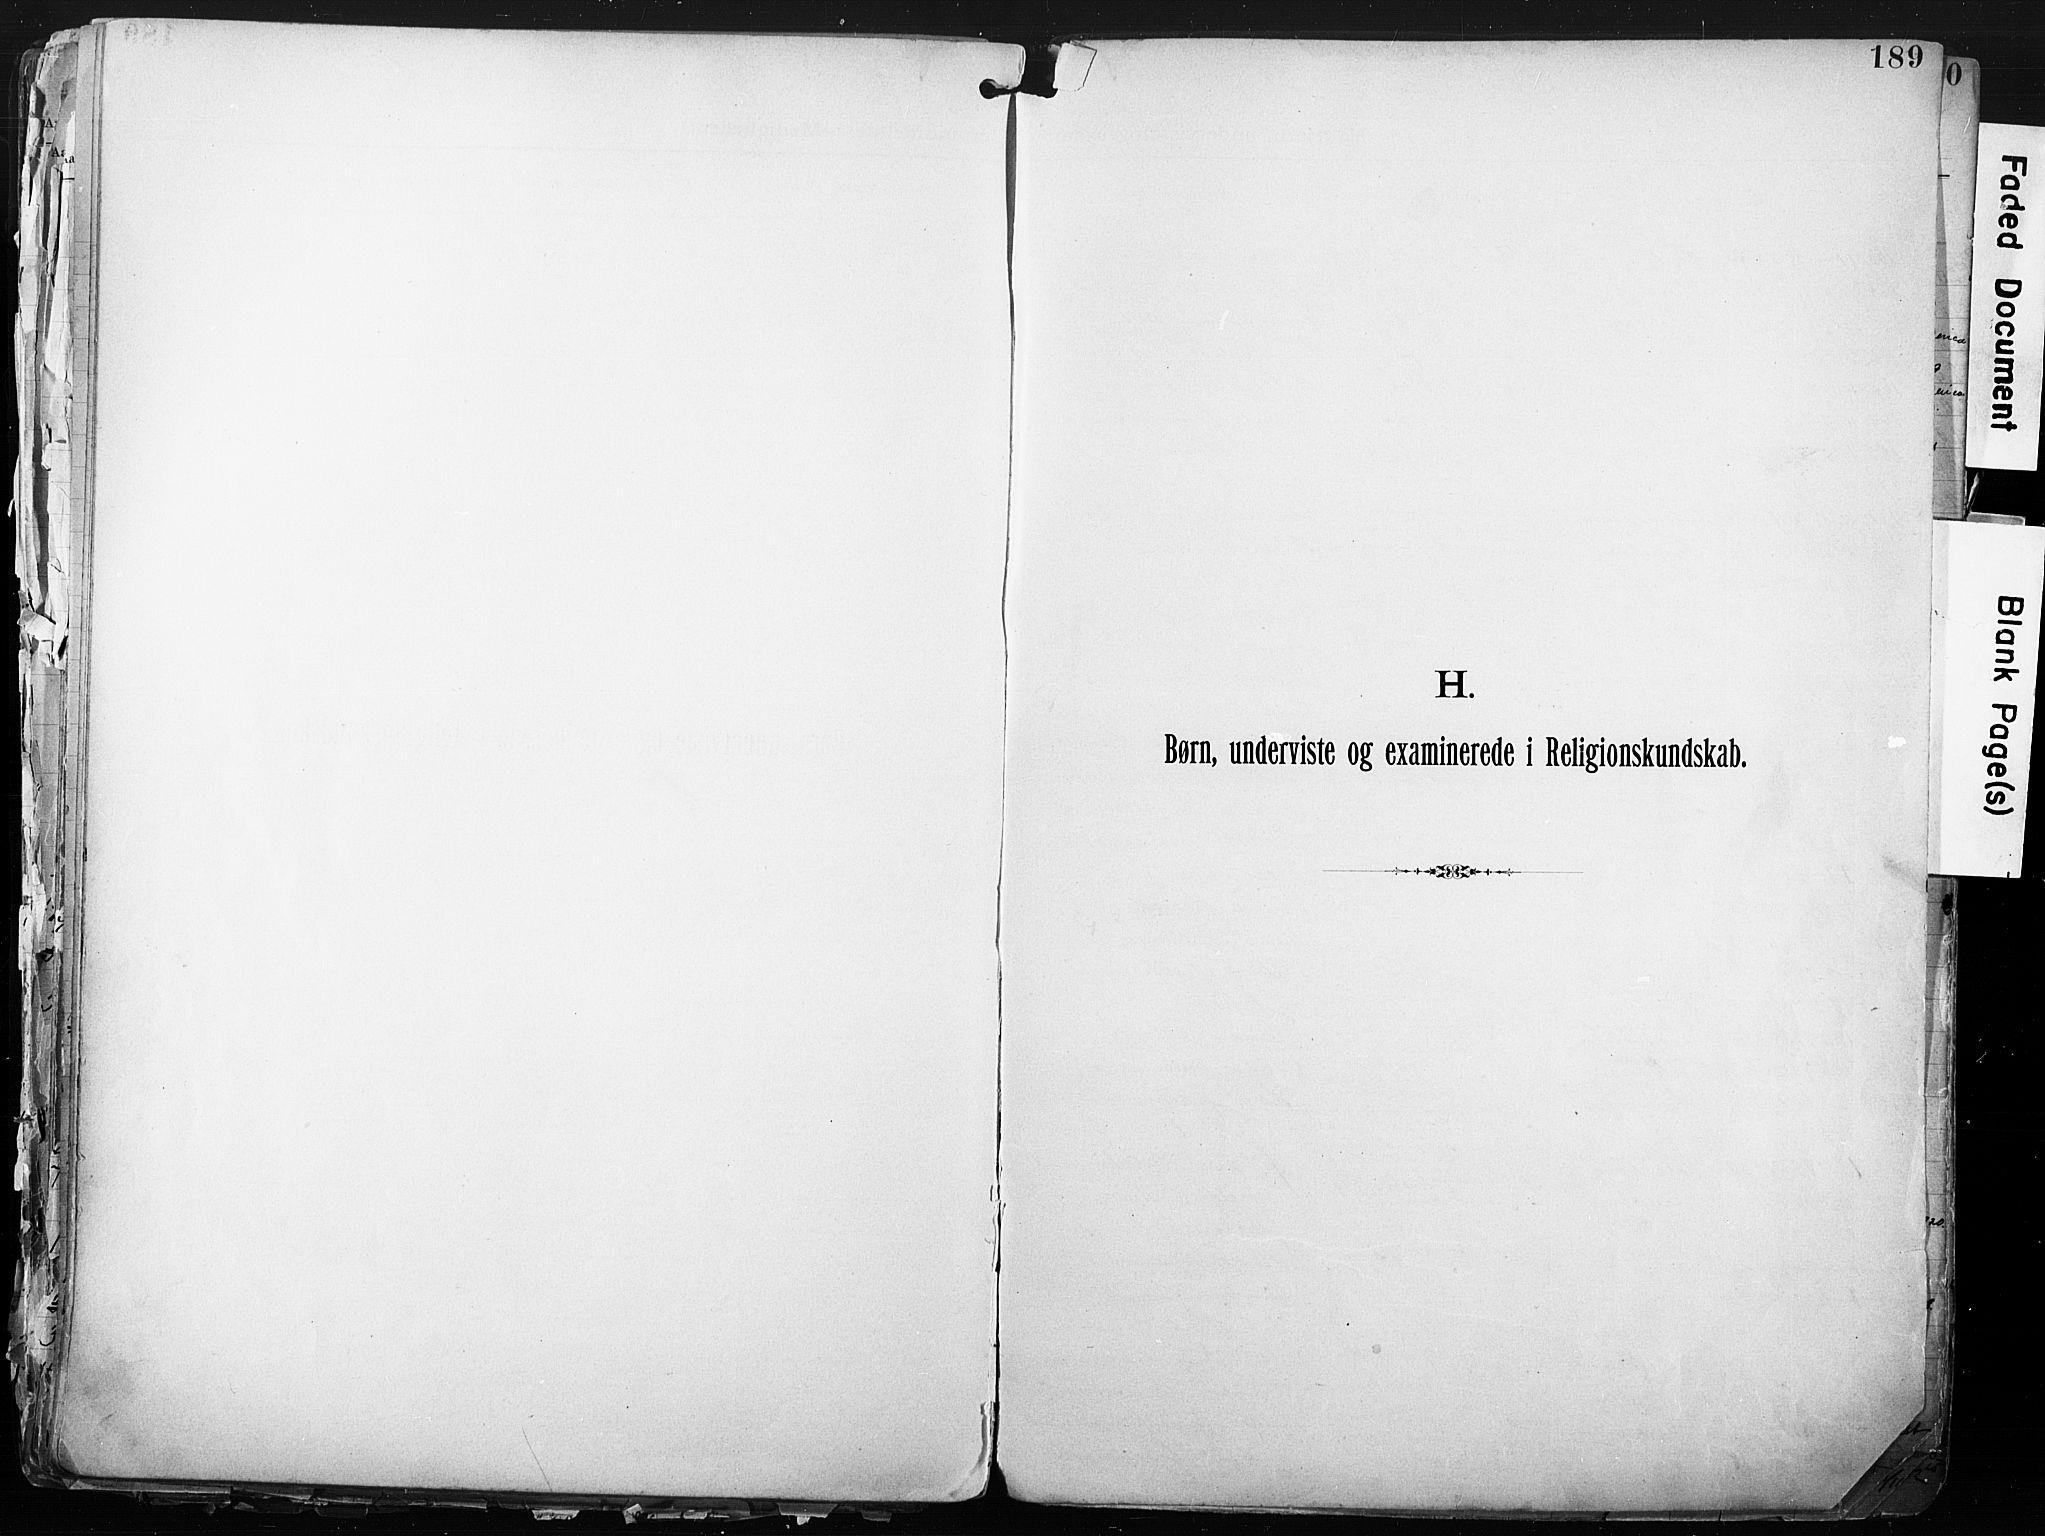 SAO, Sarpsborg metodistkirke, A/L0004: Dissenterprotokoll nr. 4, 1892-1923, s. 189